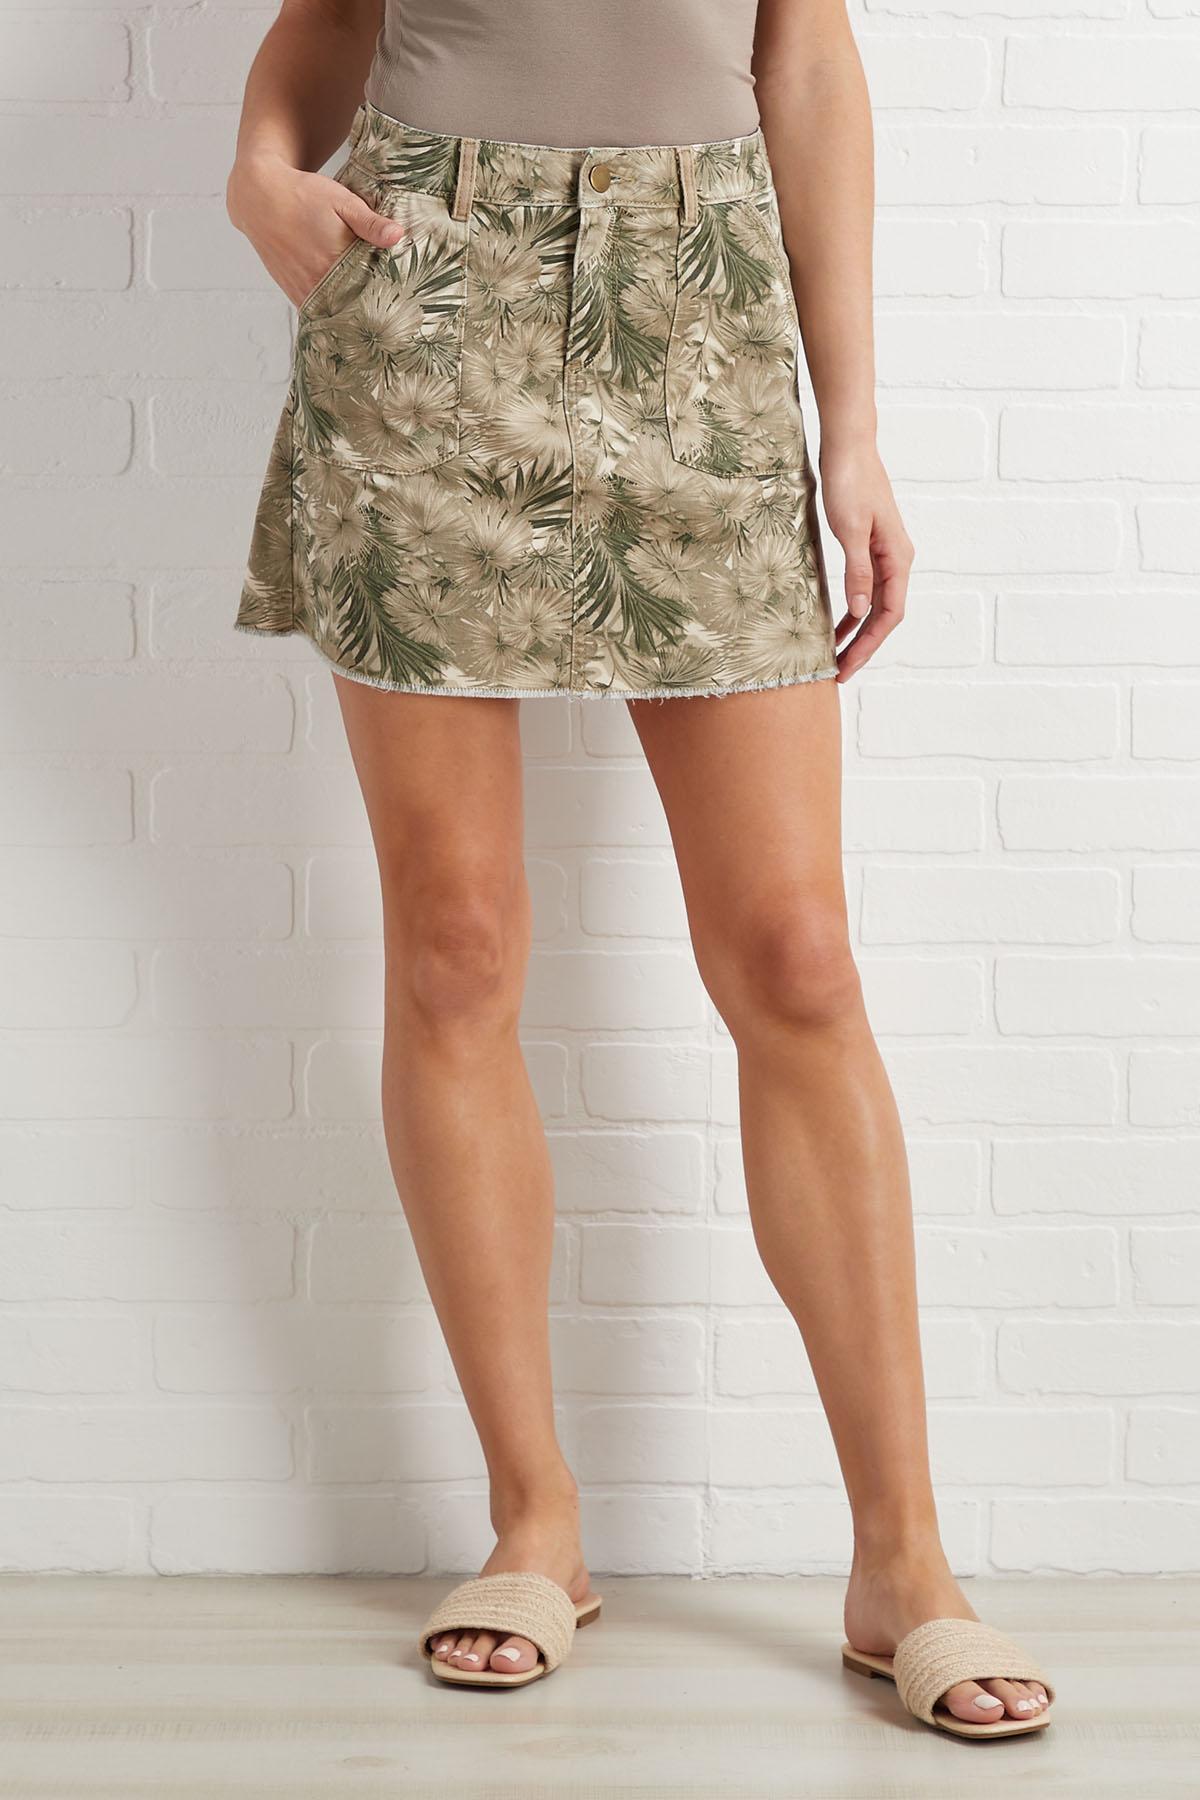 Jungle Jingle Skirt